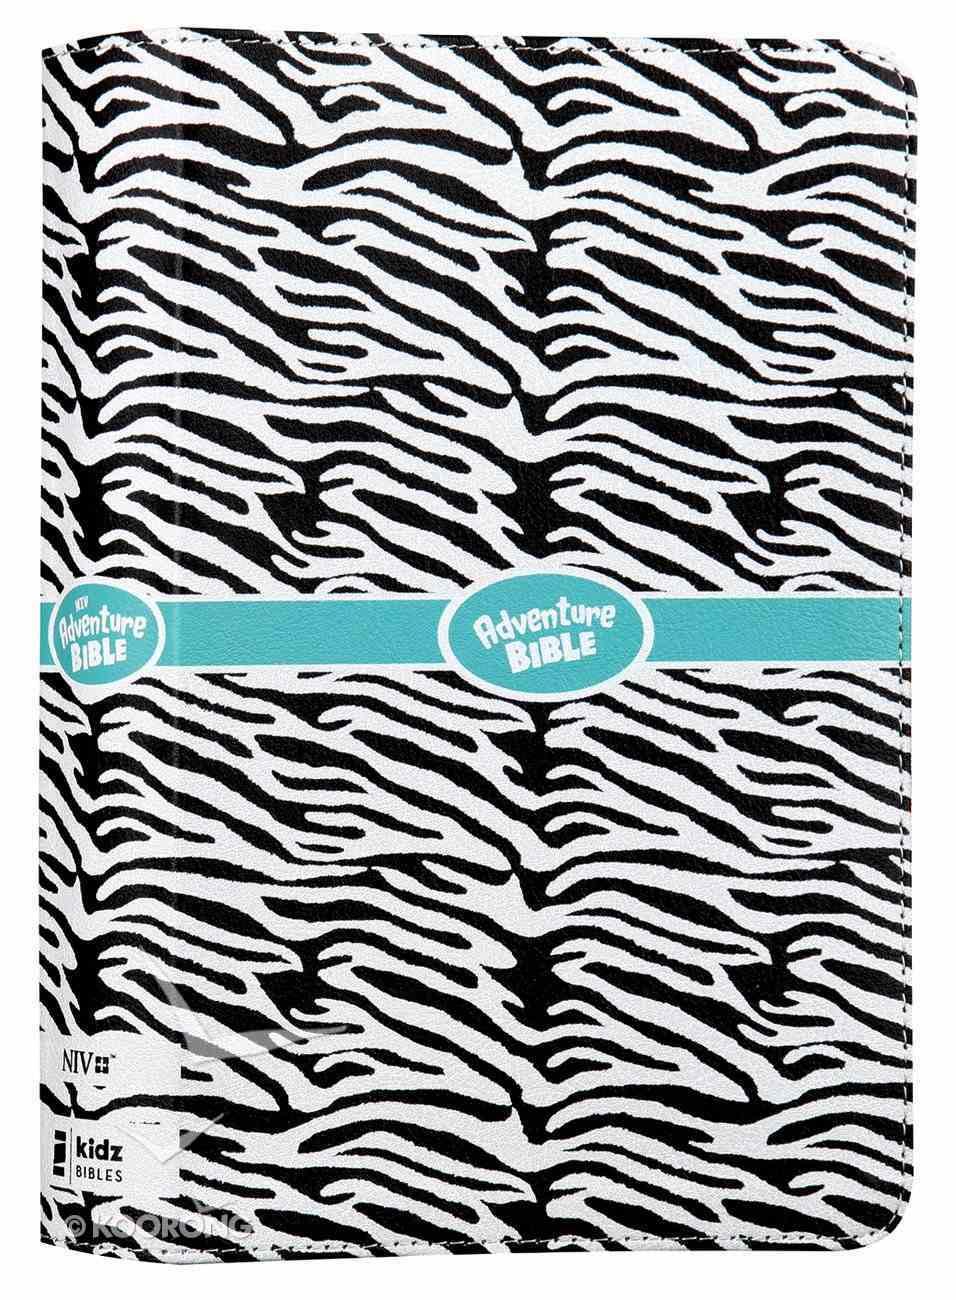 NIV Adventure Bible Zebra Print (Black Letter Edition) Premium Imitation Leather